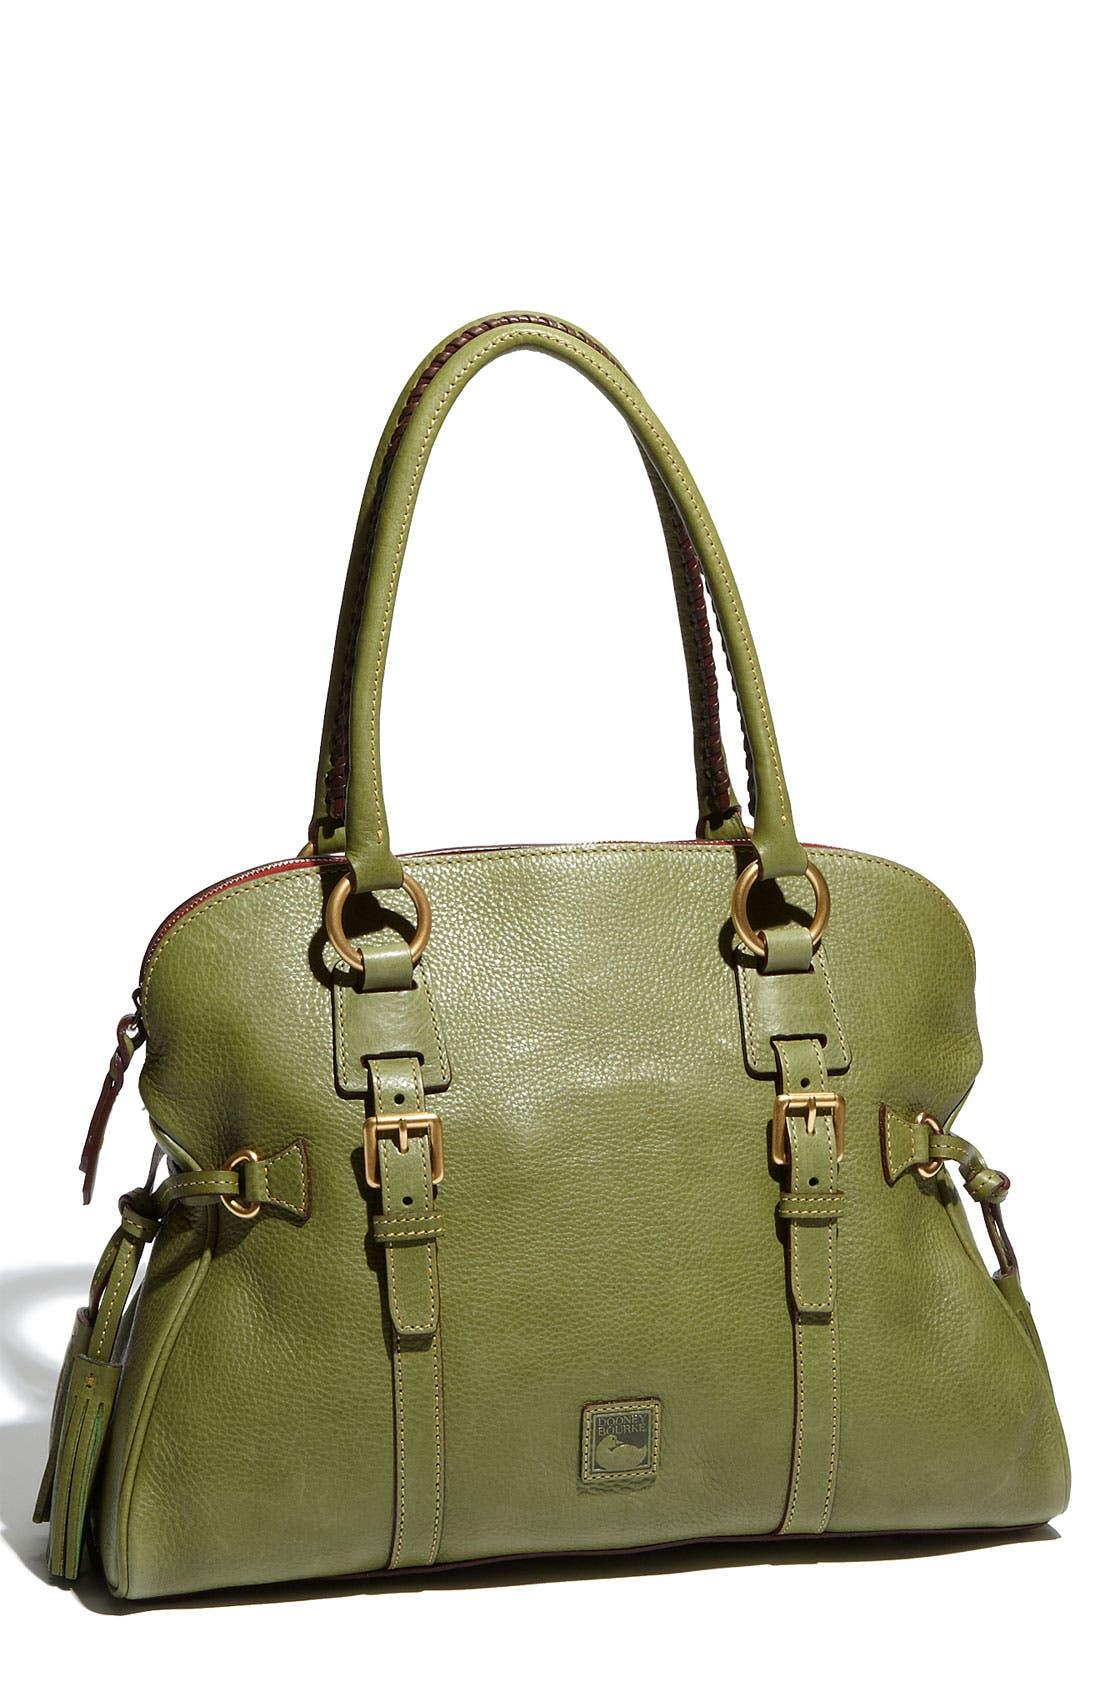 Alternate Image 1 Selected - Dooney & Bourke 'Florentine Collection' Domed Leather Buckle Satchel